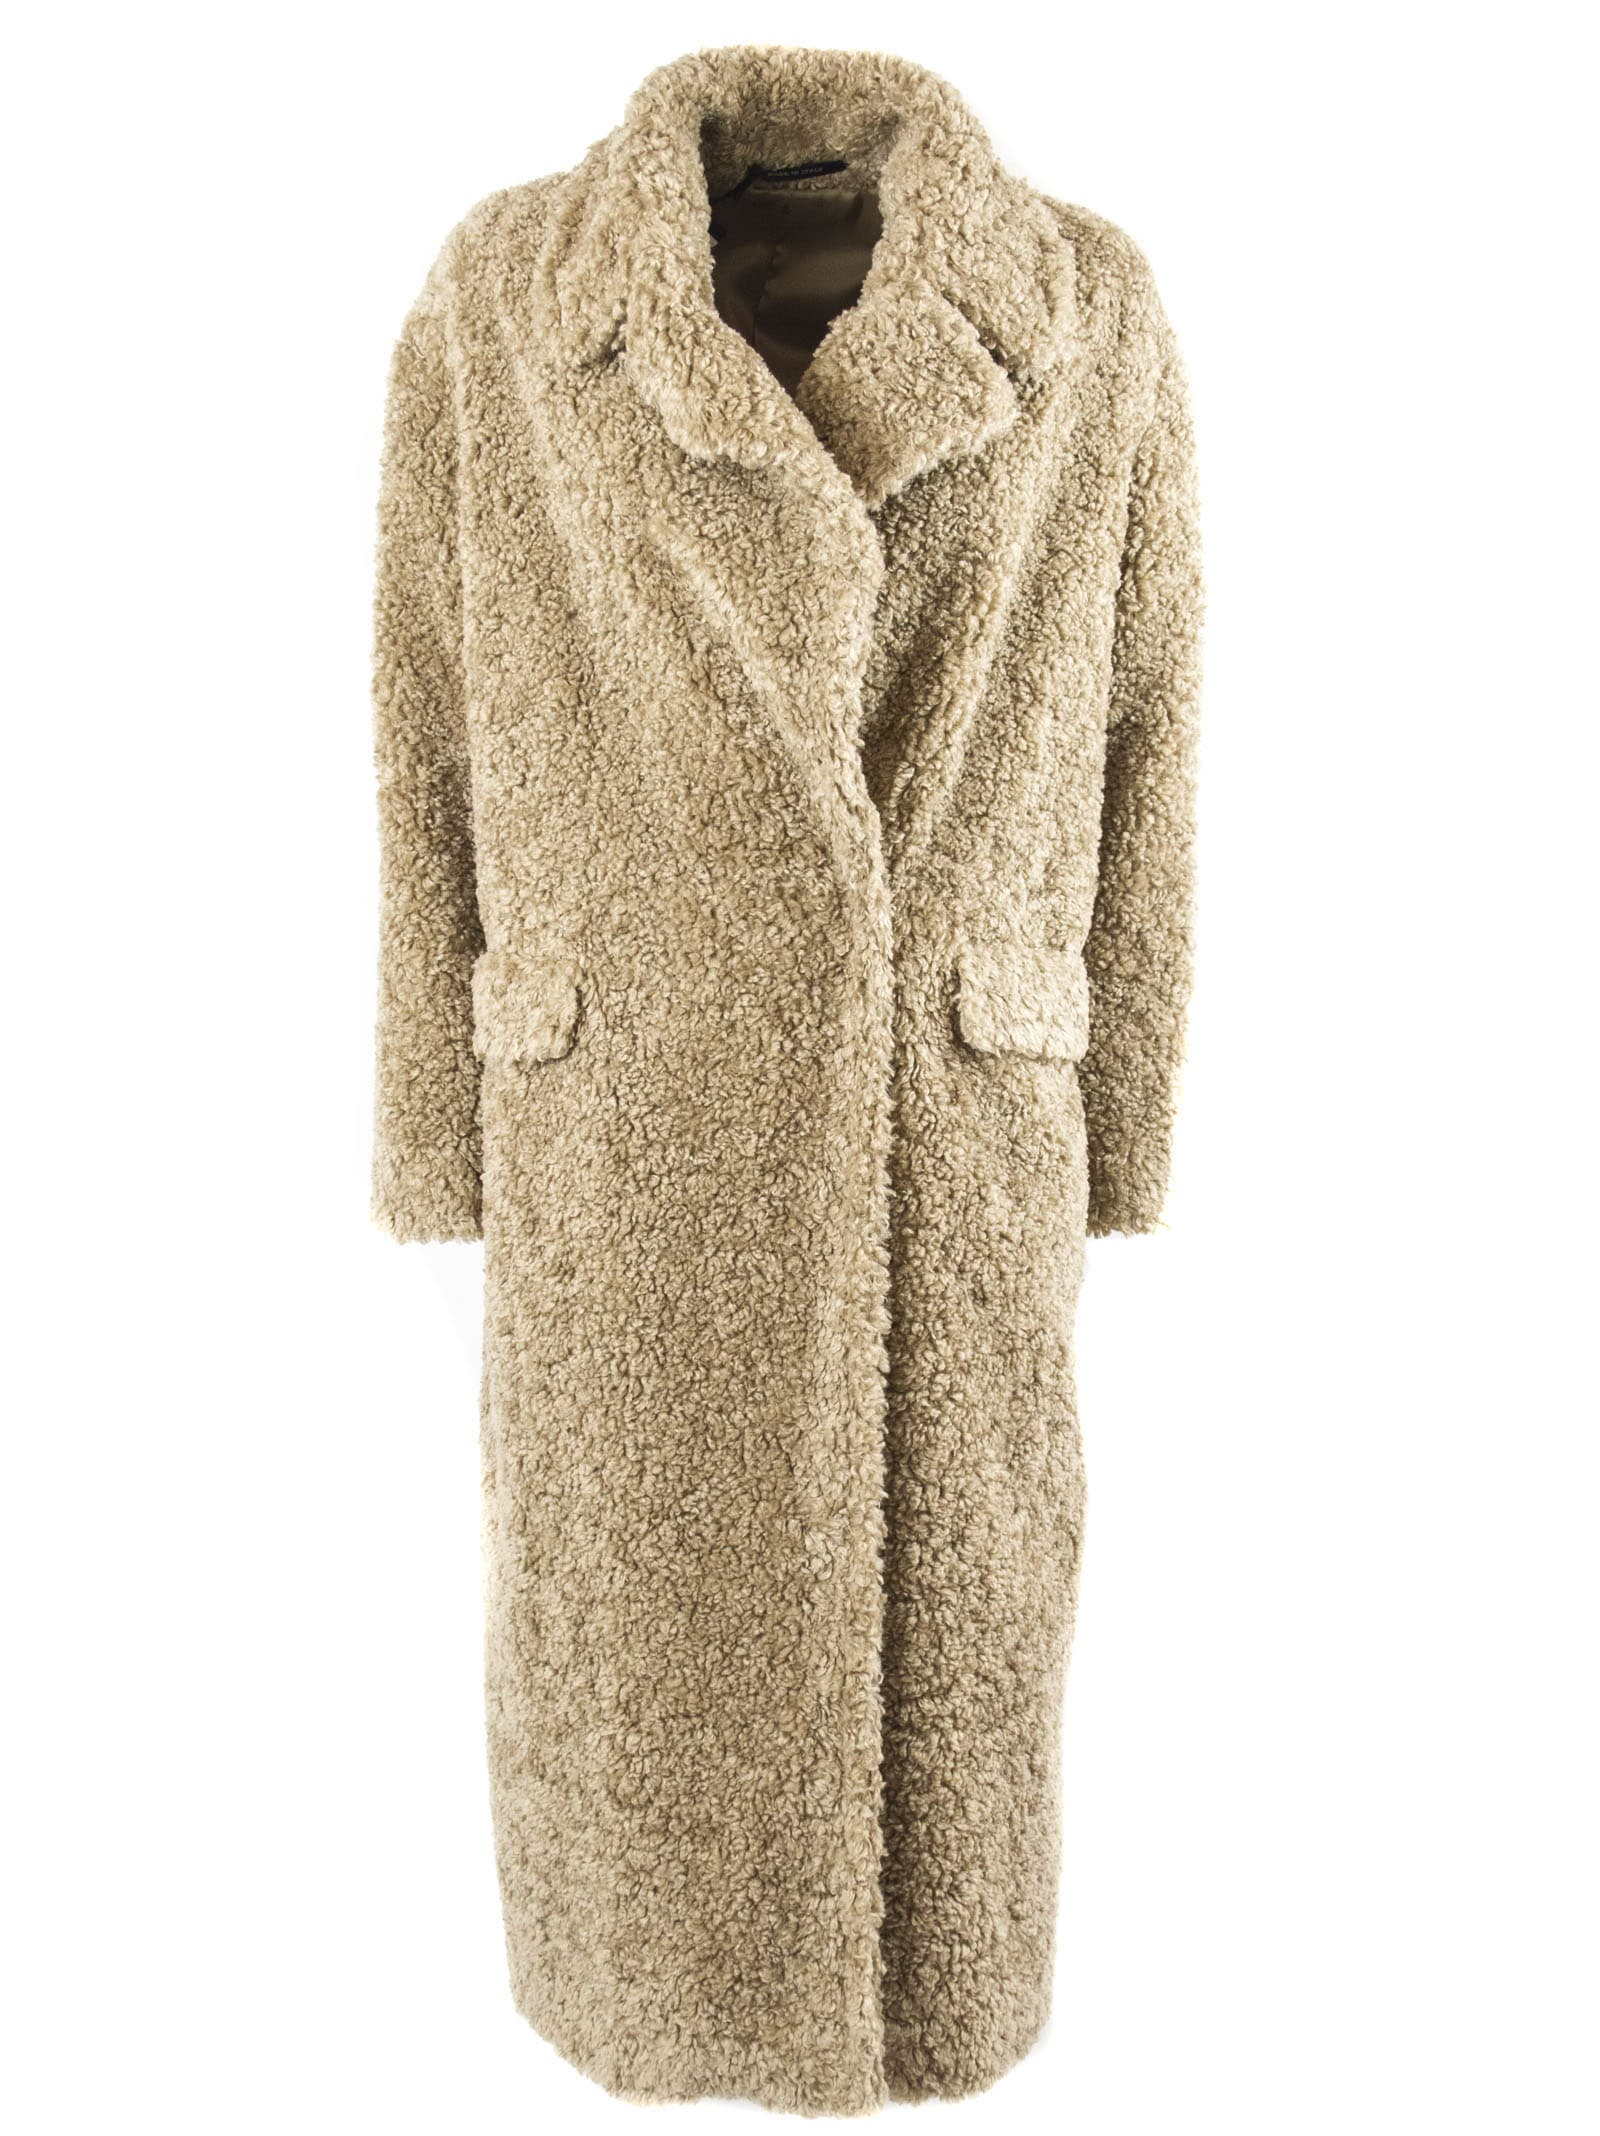 Tagliatore Cathy Faux-shearling Coat